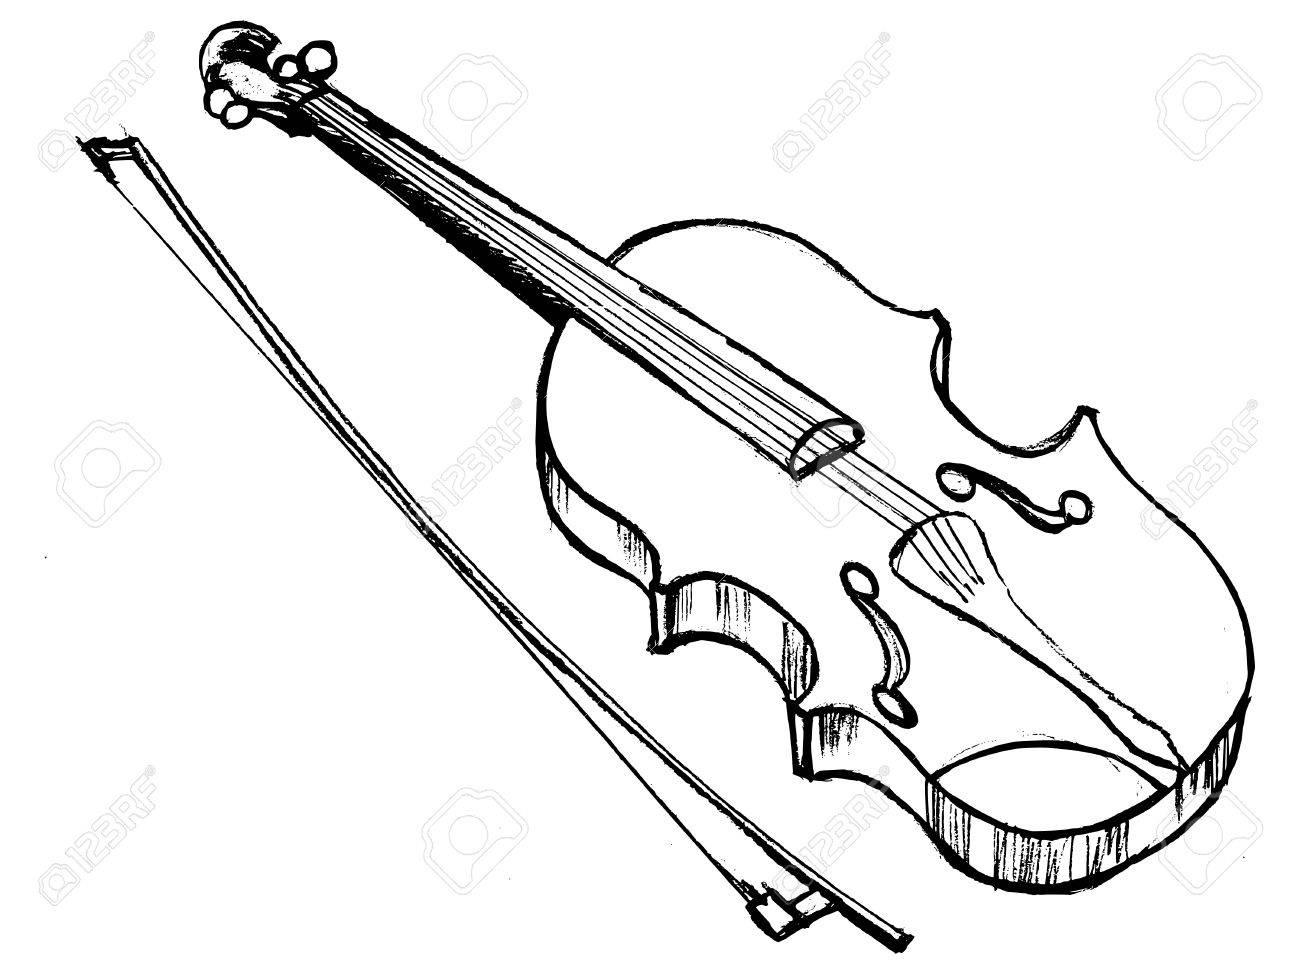 1300x974 Hand Drawn, Sketch Illustration Of Violin Royalty Free Cliparts